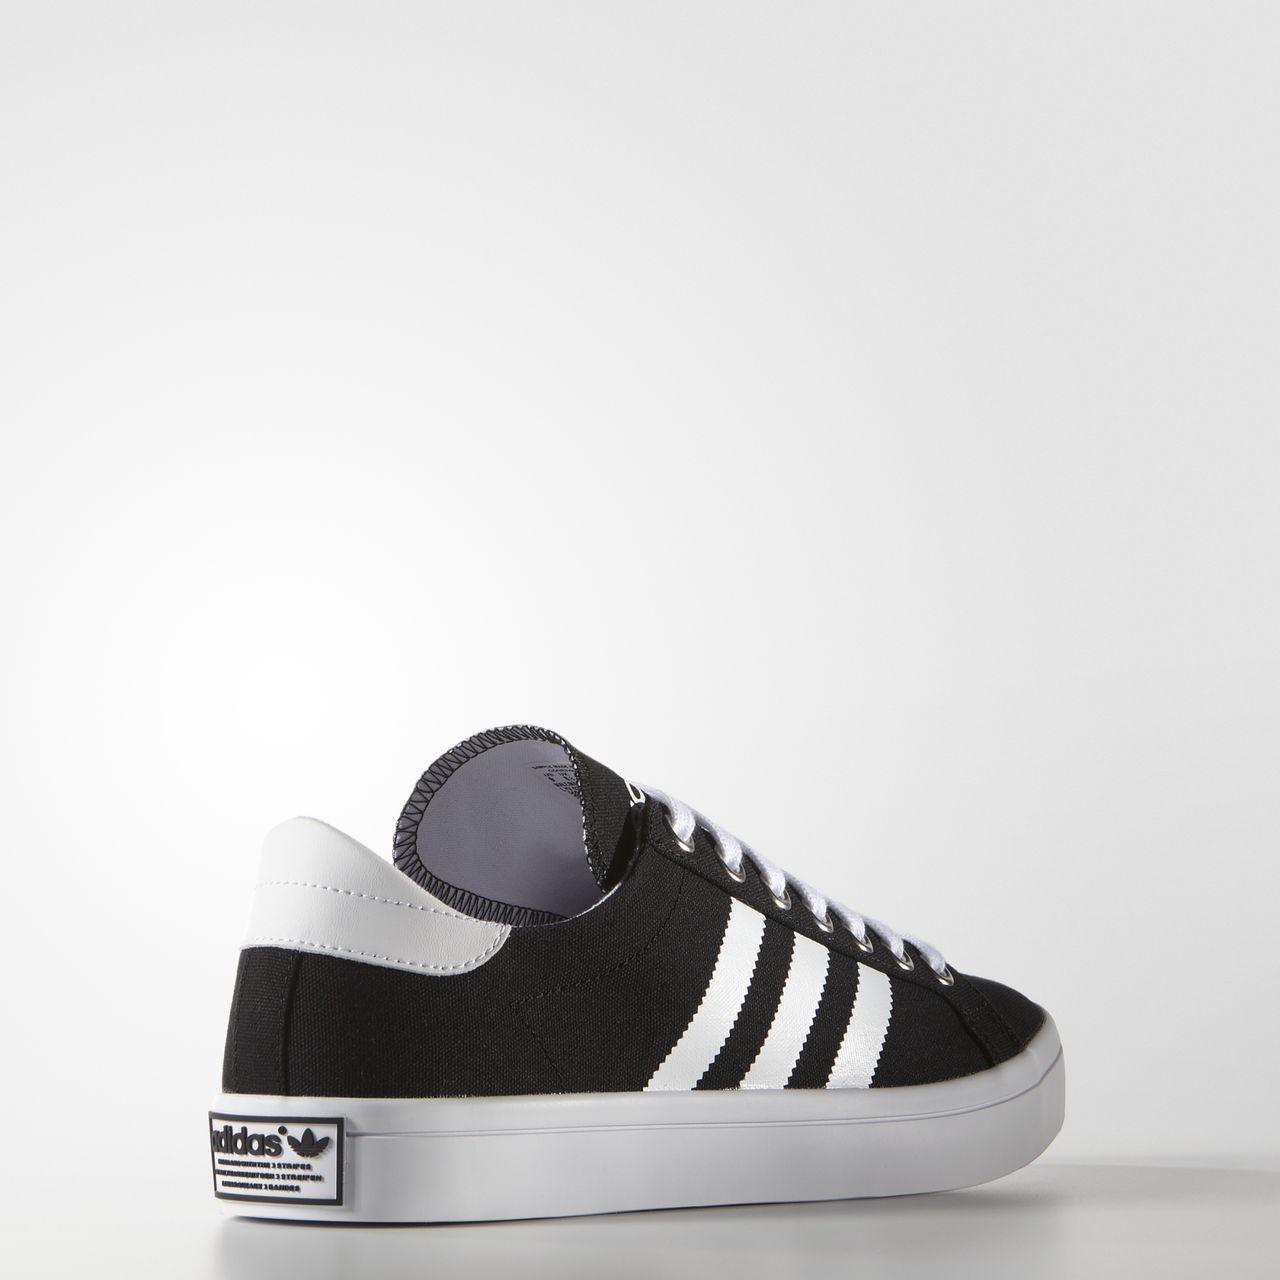 adidas Court Vantage Shoes | Sneakers | Adidas, Adidas